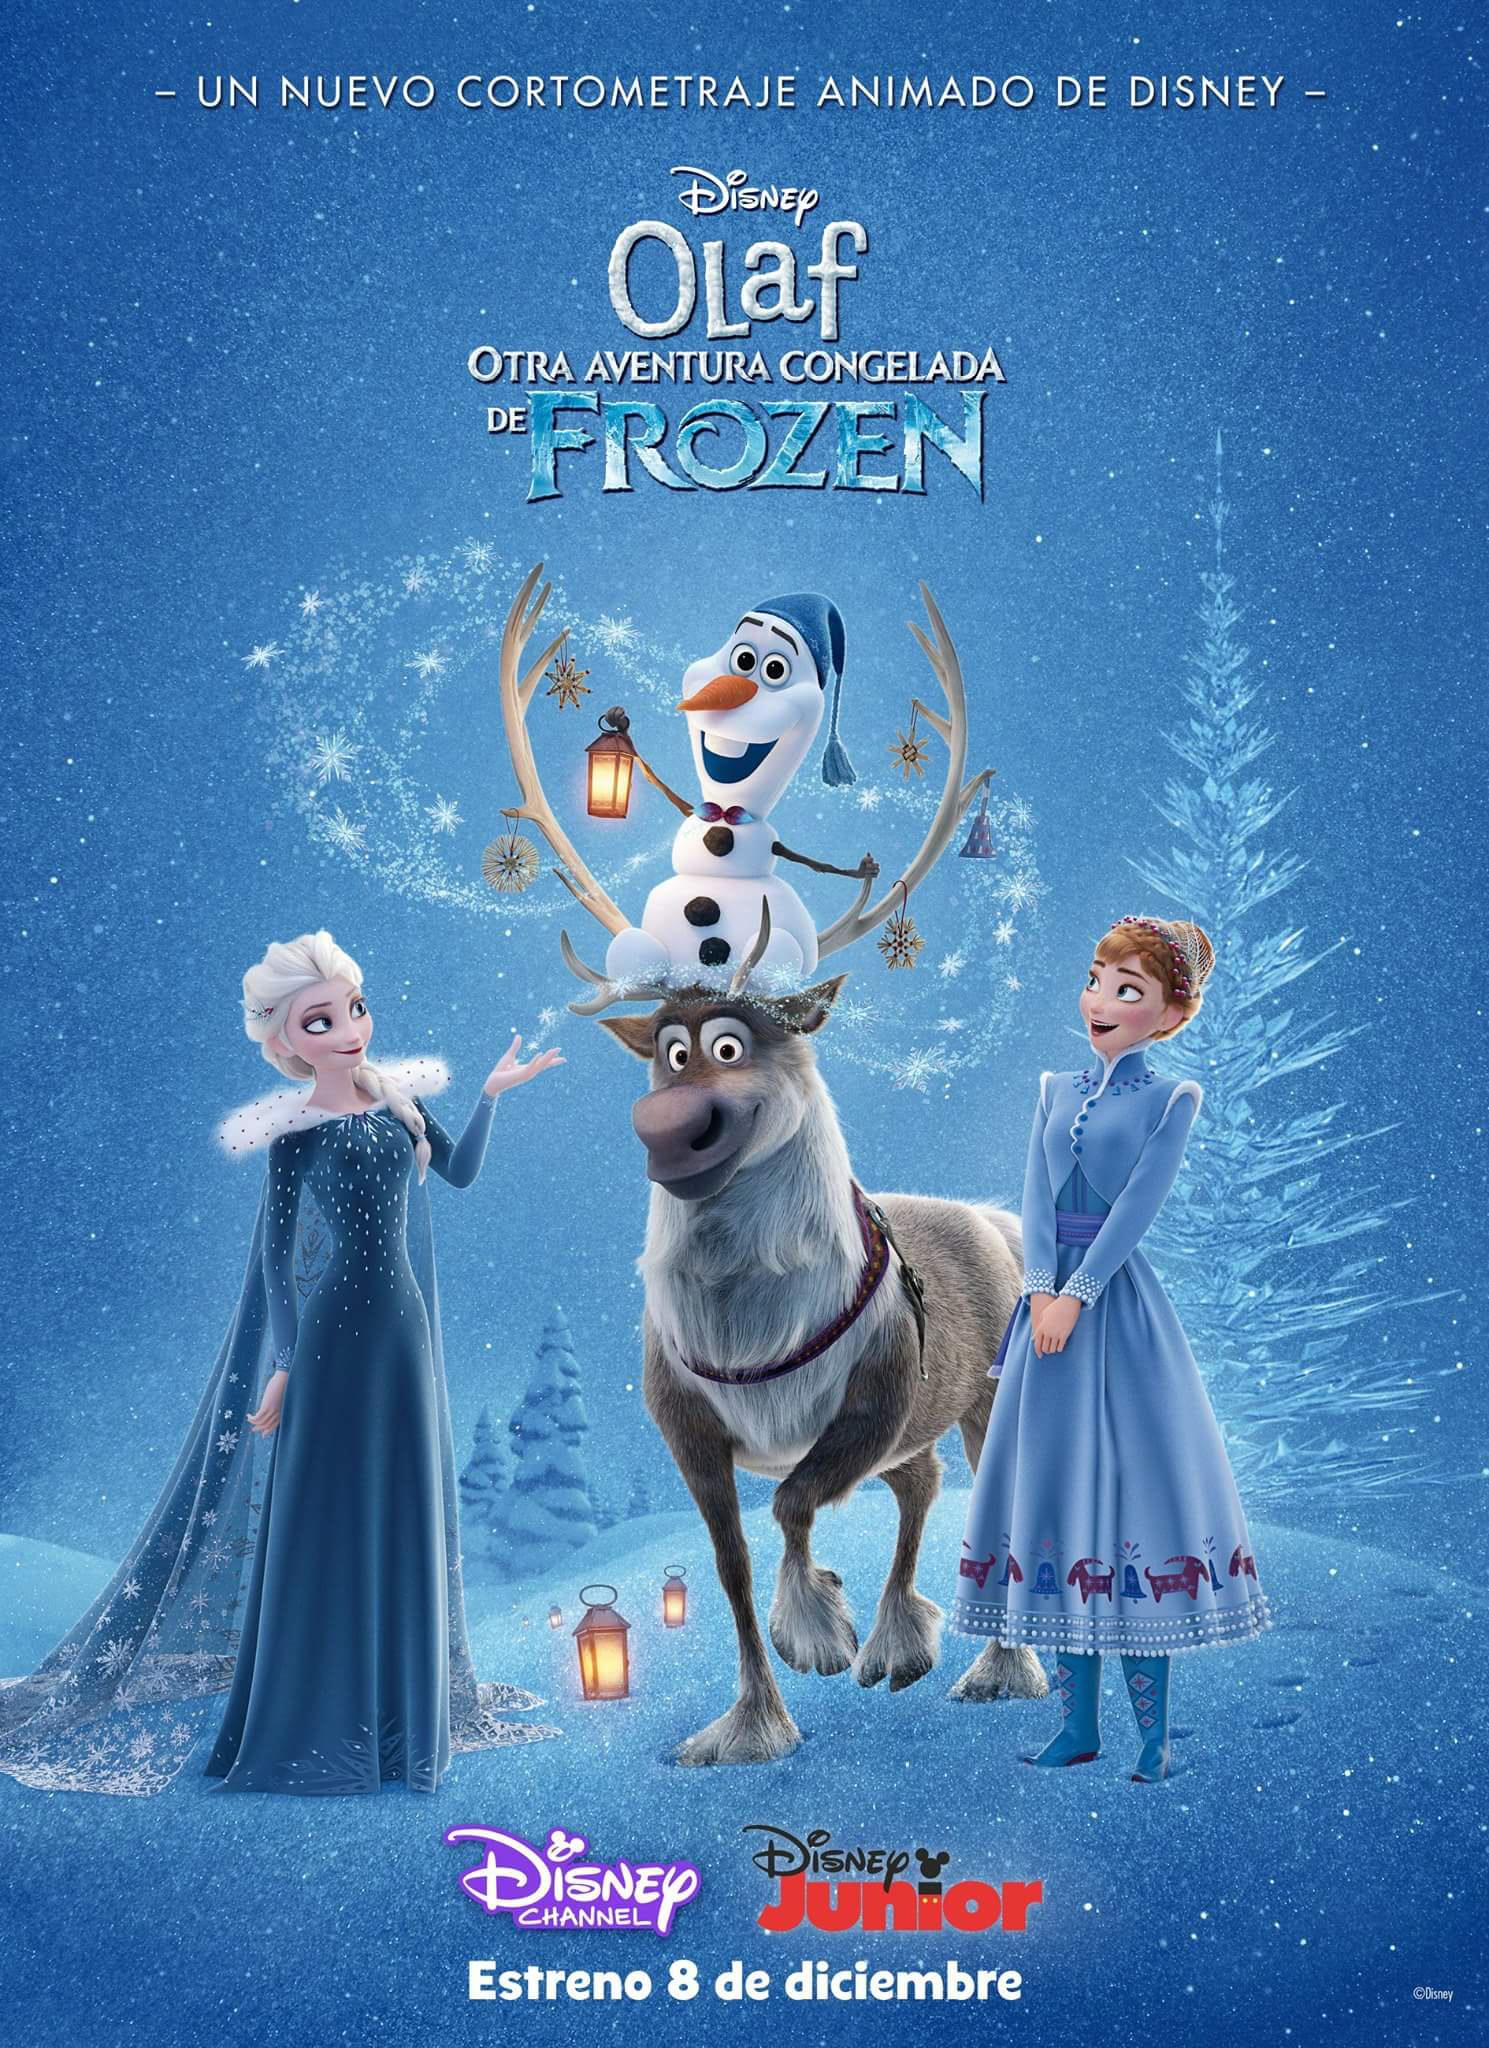 Imagen - Olaf Otra Aventura Congelada de Frozen Poster3.jpg | Wiki ...